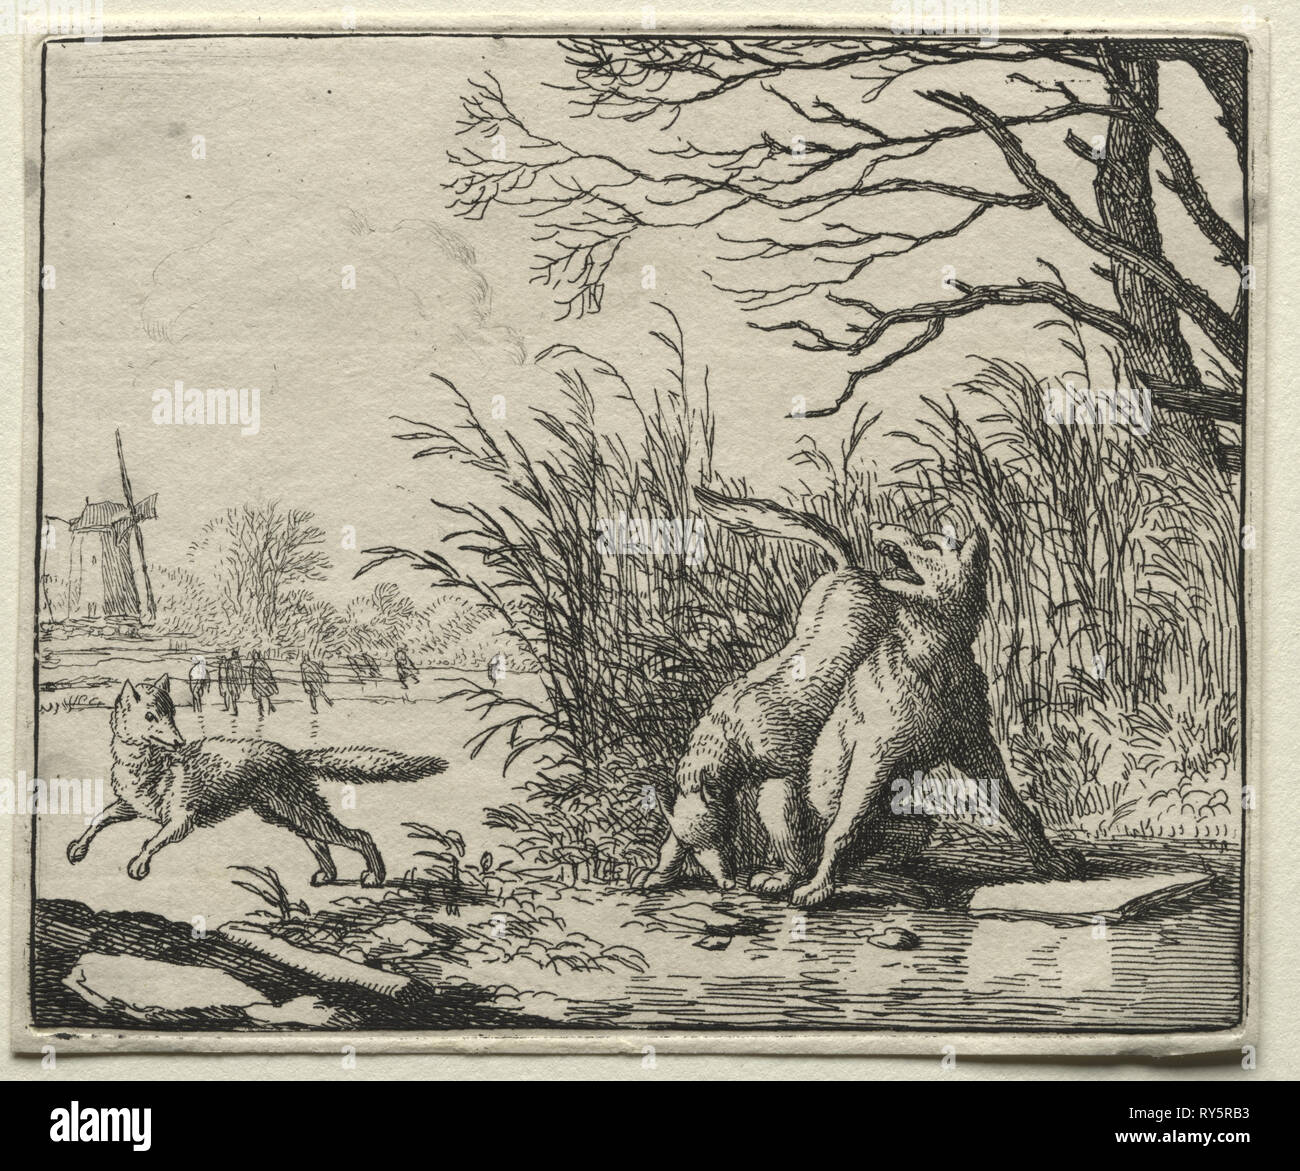 Reynard the Fox:  A New Accusation by the Wolf. Allart van Everdingen (Dutch, 1621-1675). Etching - Stock Image